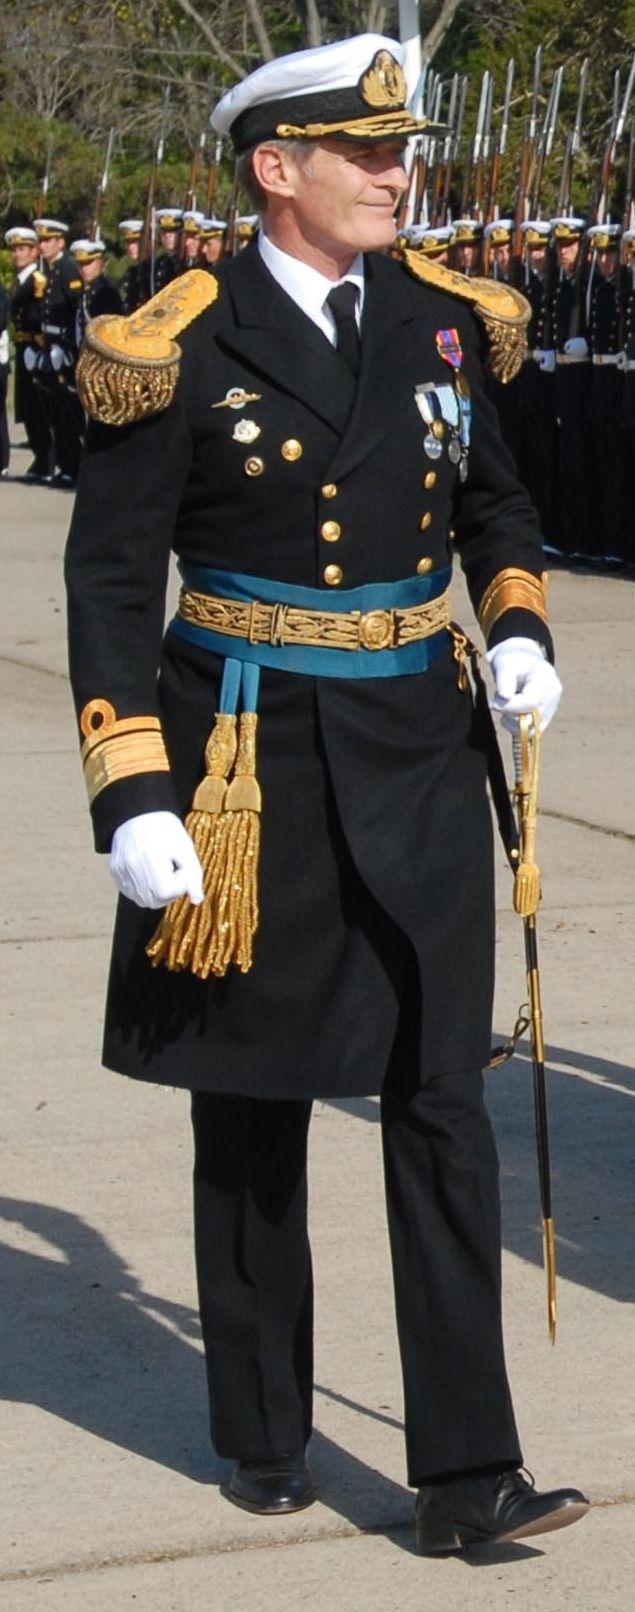 Uniforme de gala de Almirantes de la Armada Argentina / Argentine Navy admirals'…